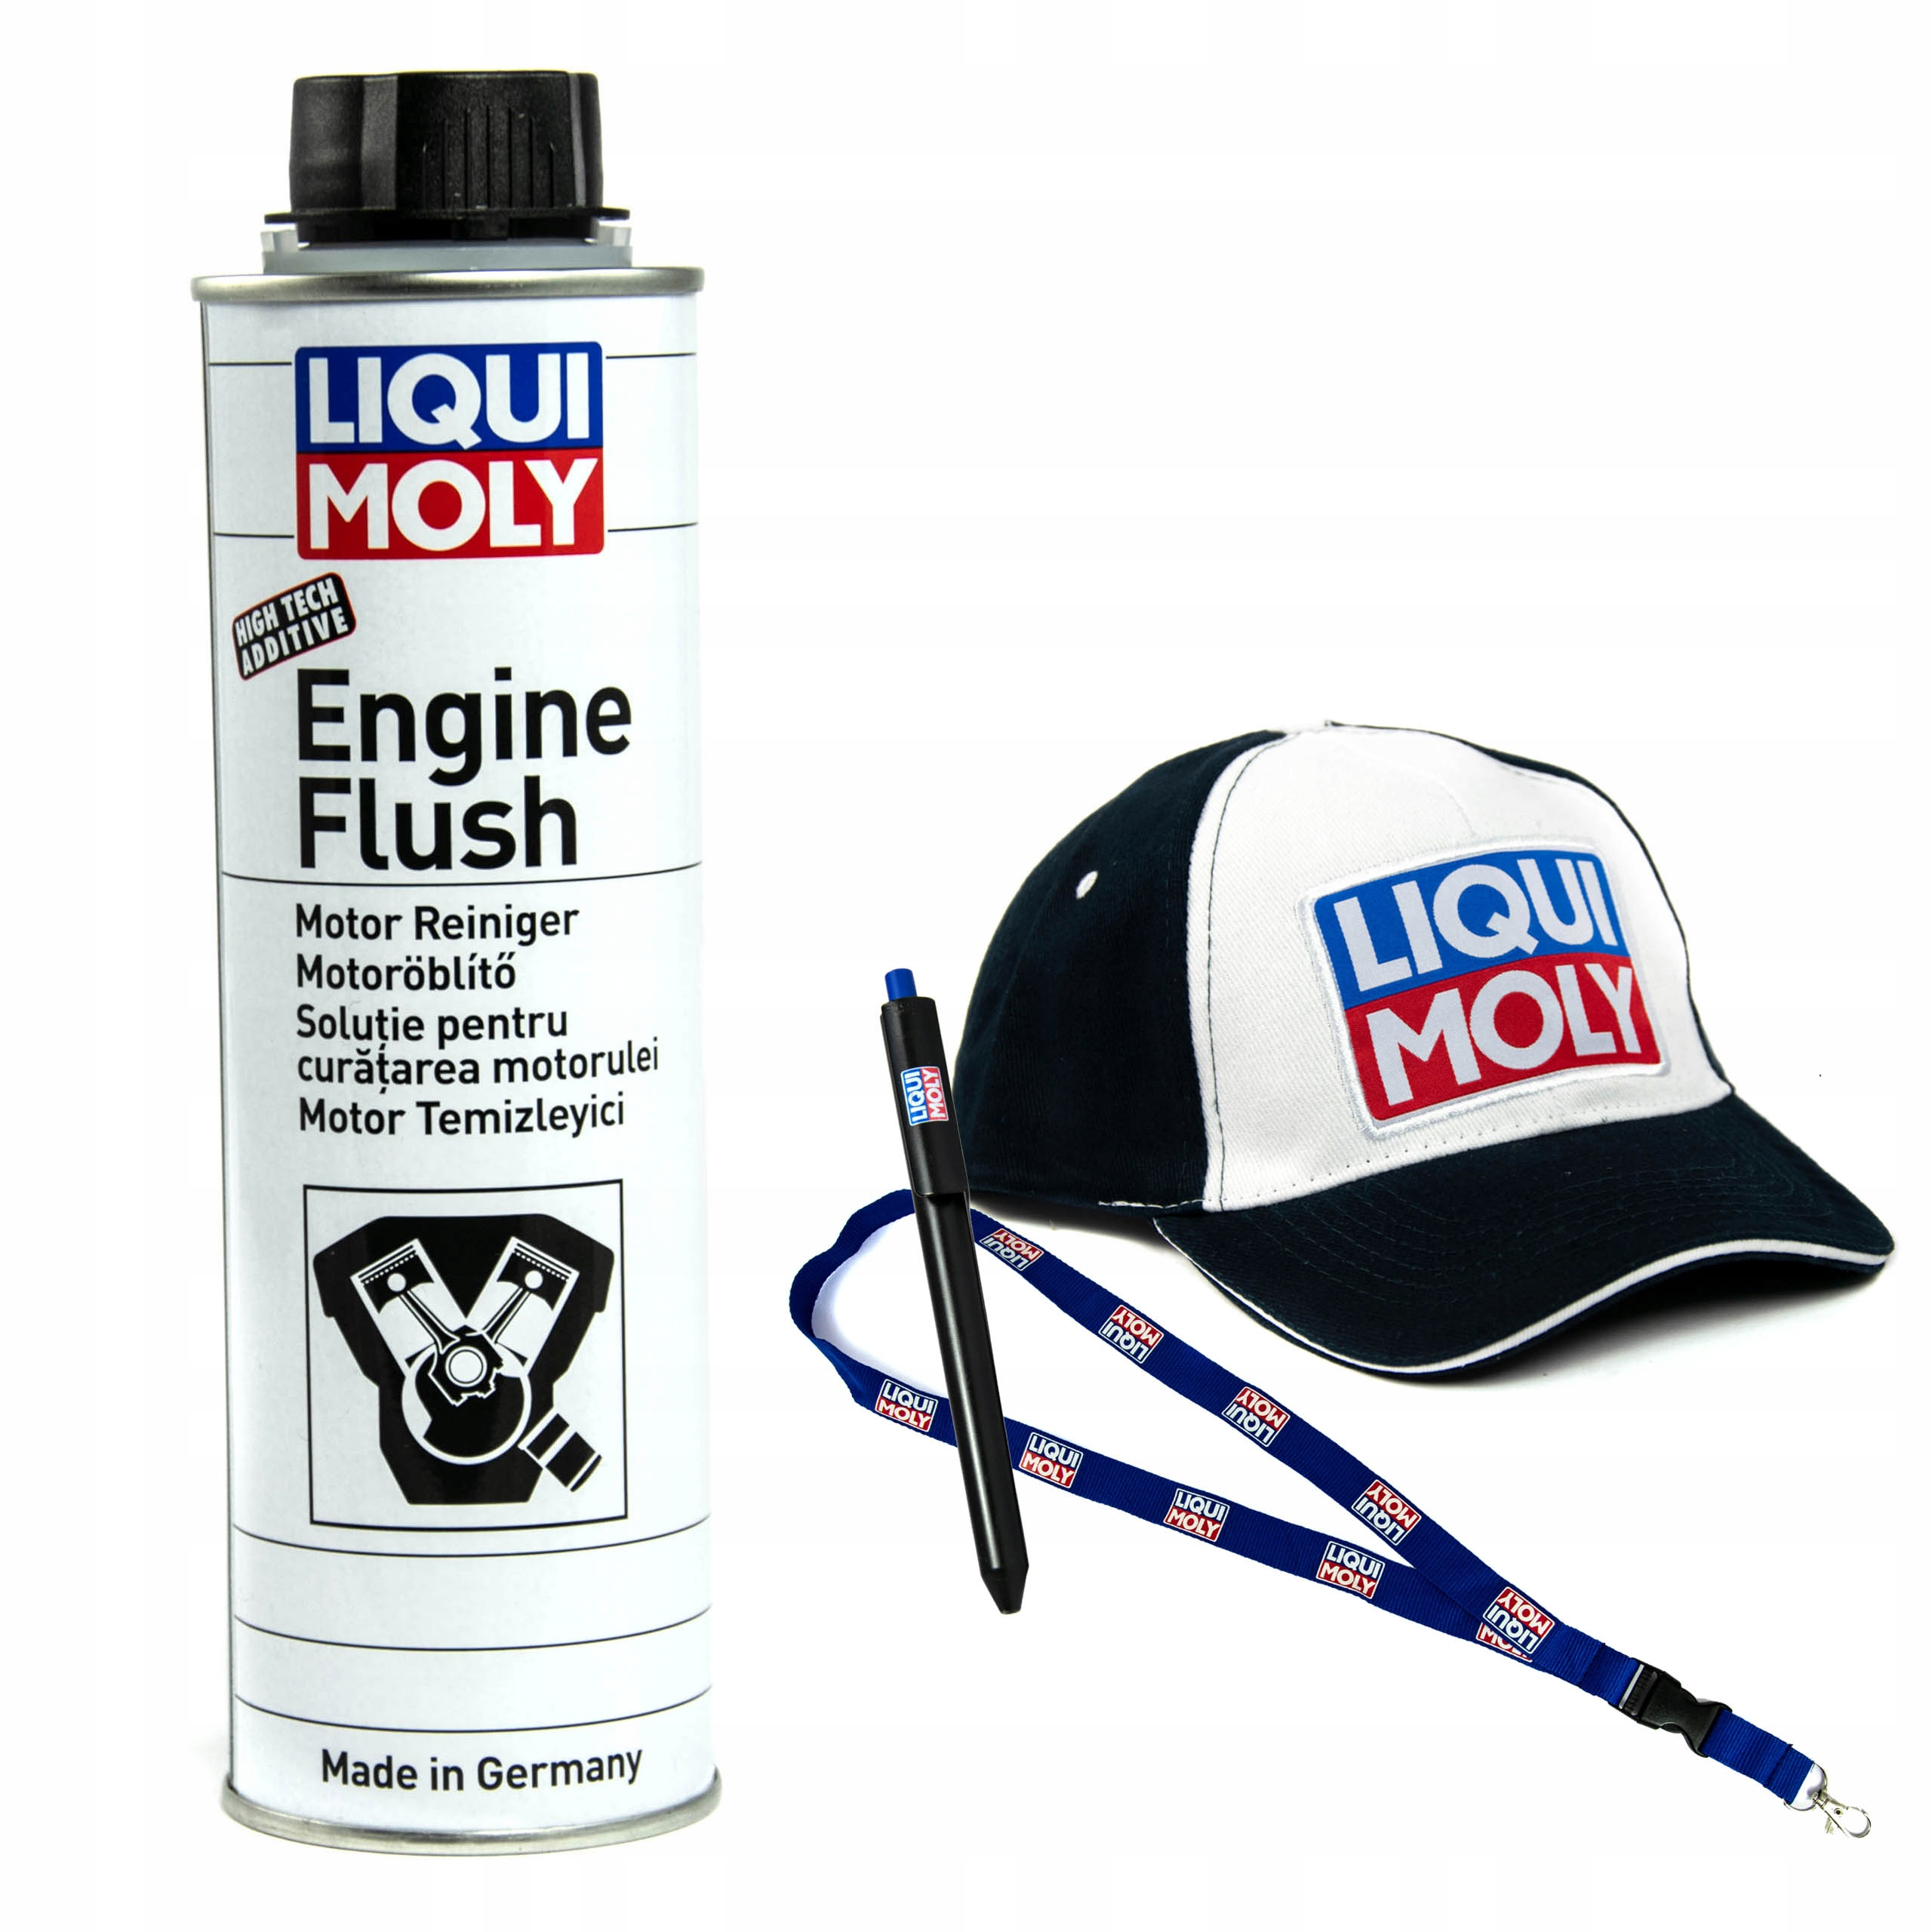 Liqui Moly Engine Flush 300ml płukanka silnik 2640